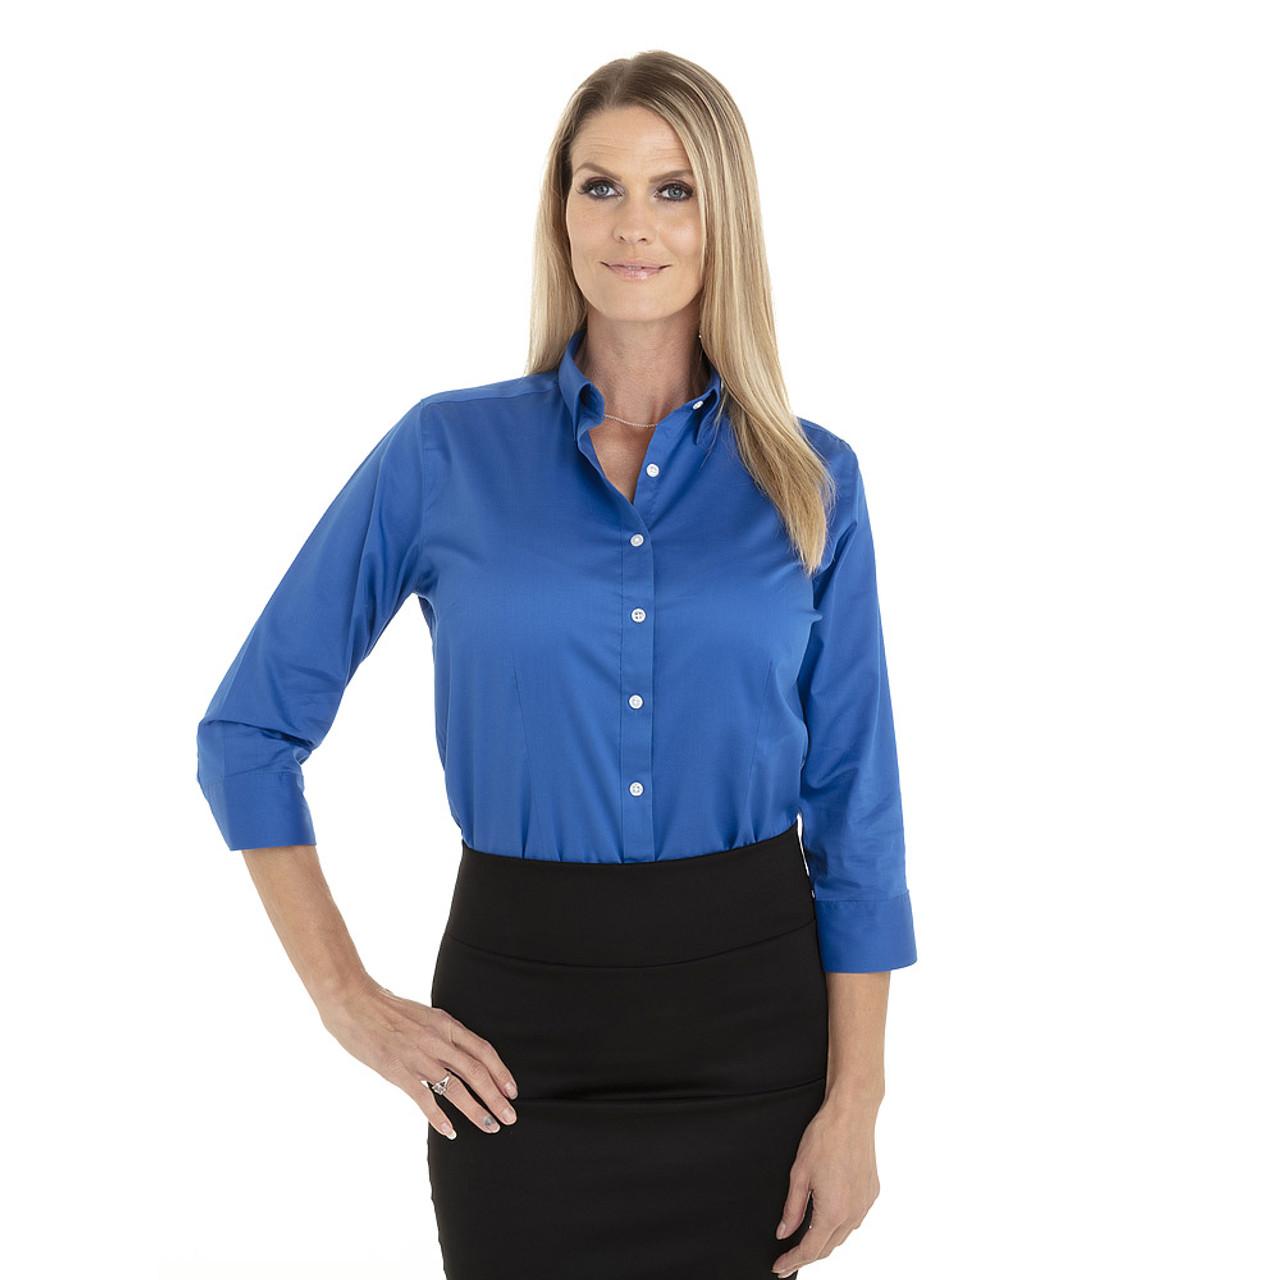 Ultra Blue - 18CV304 Van Heusen Ladies' ¾ Sleeve Dress Twill Shirt | T-shirt.ca